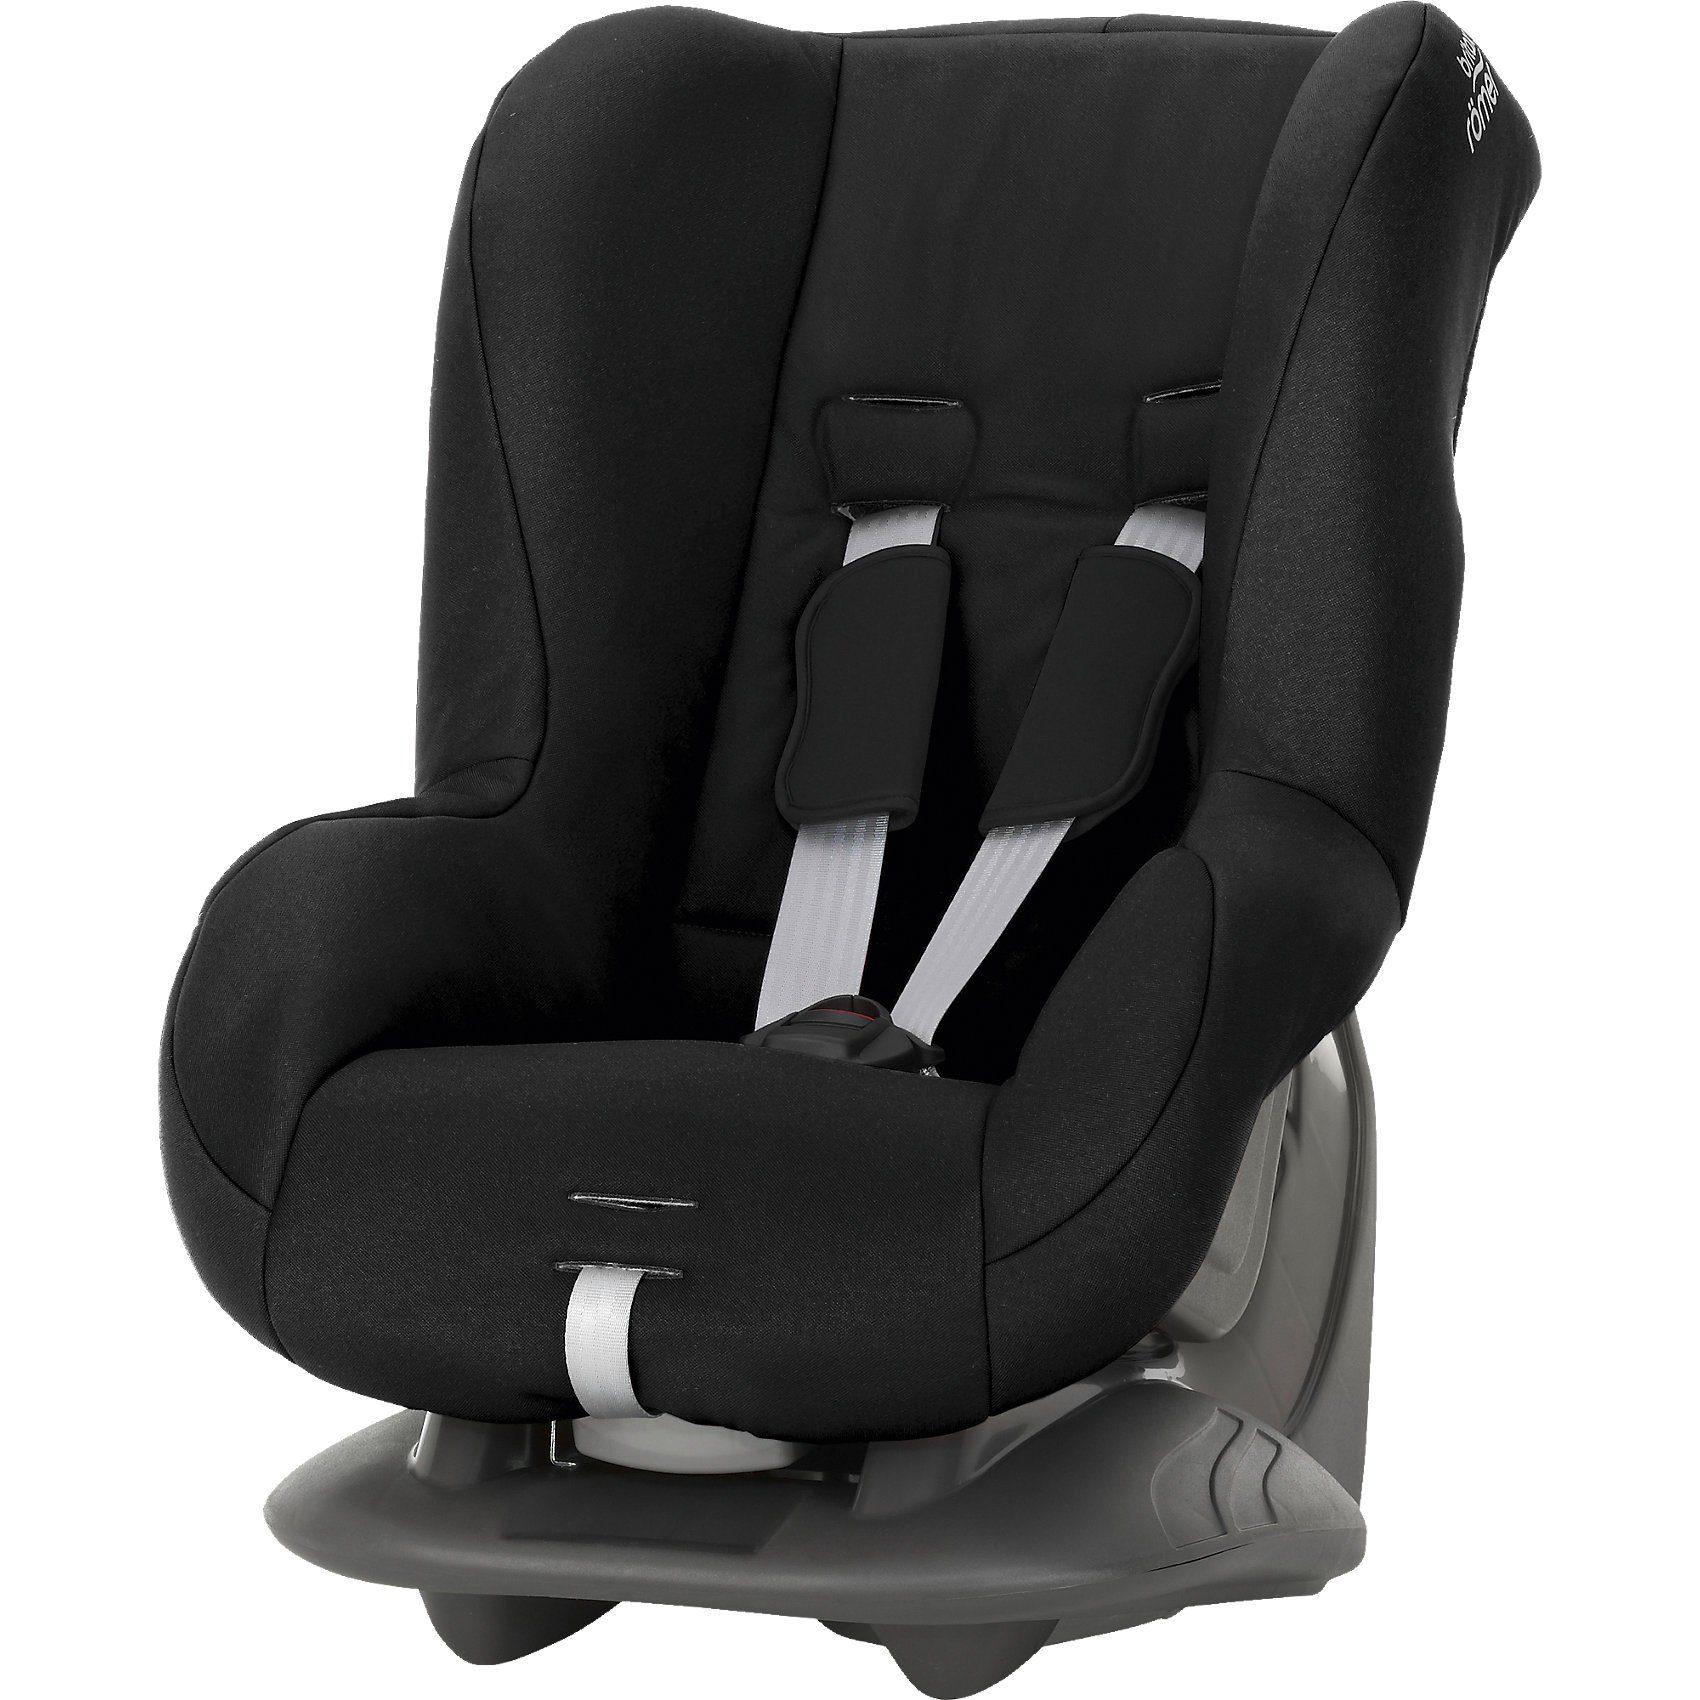 Britax Auto-Kindersitz Eclipse, Cosmos Black, 2016